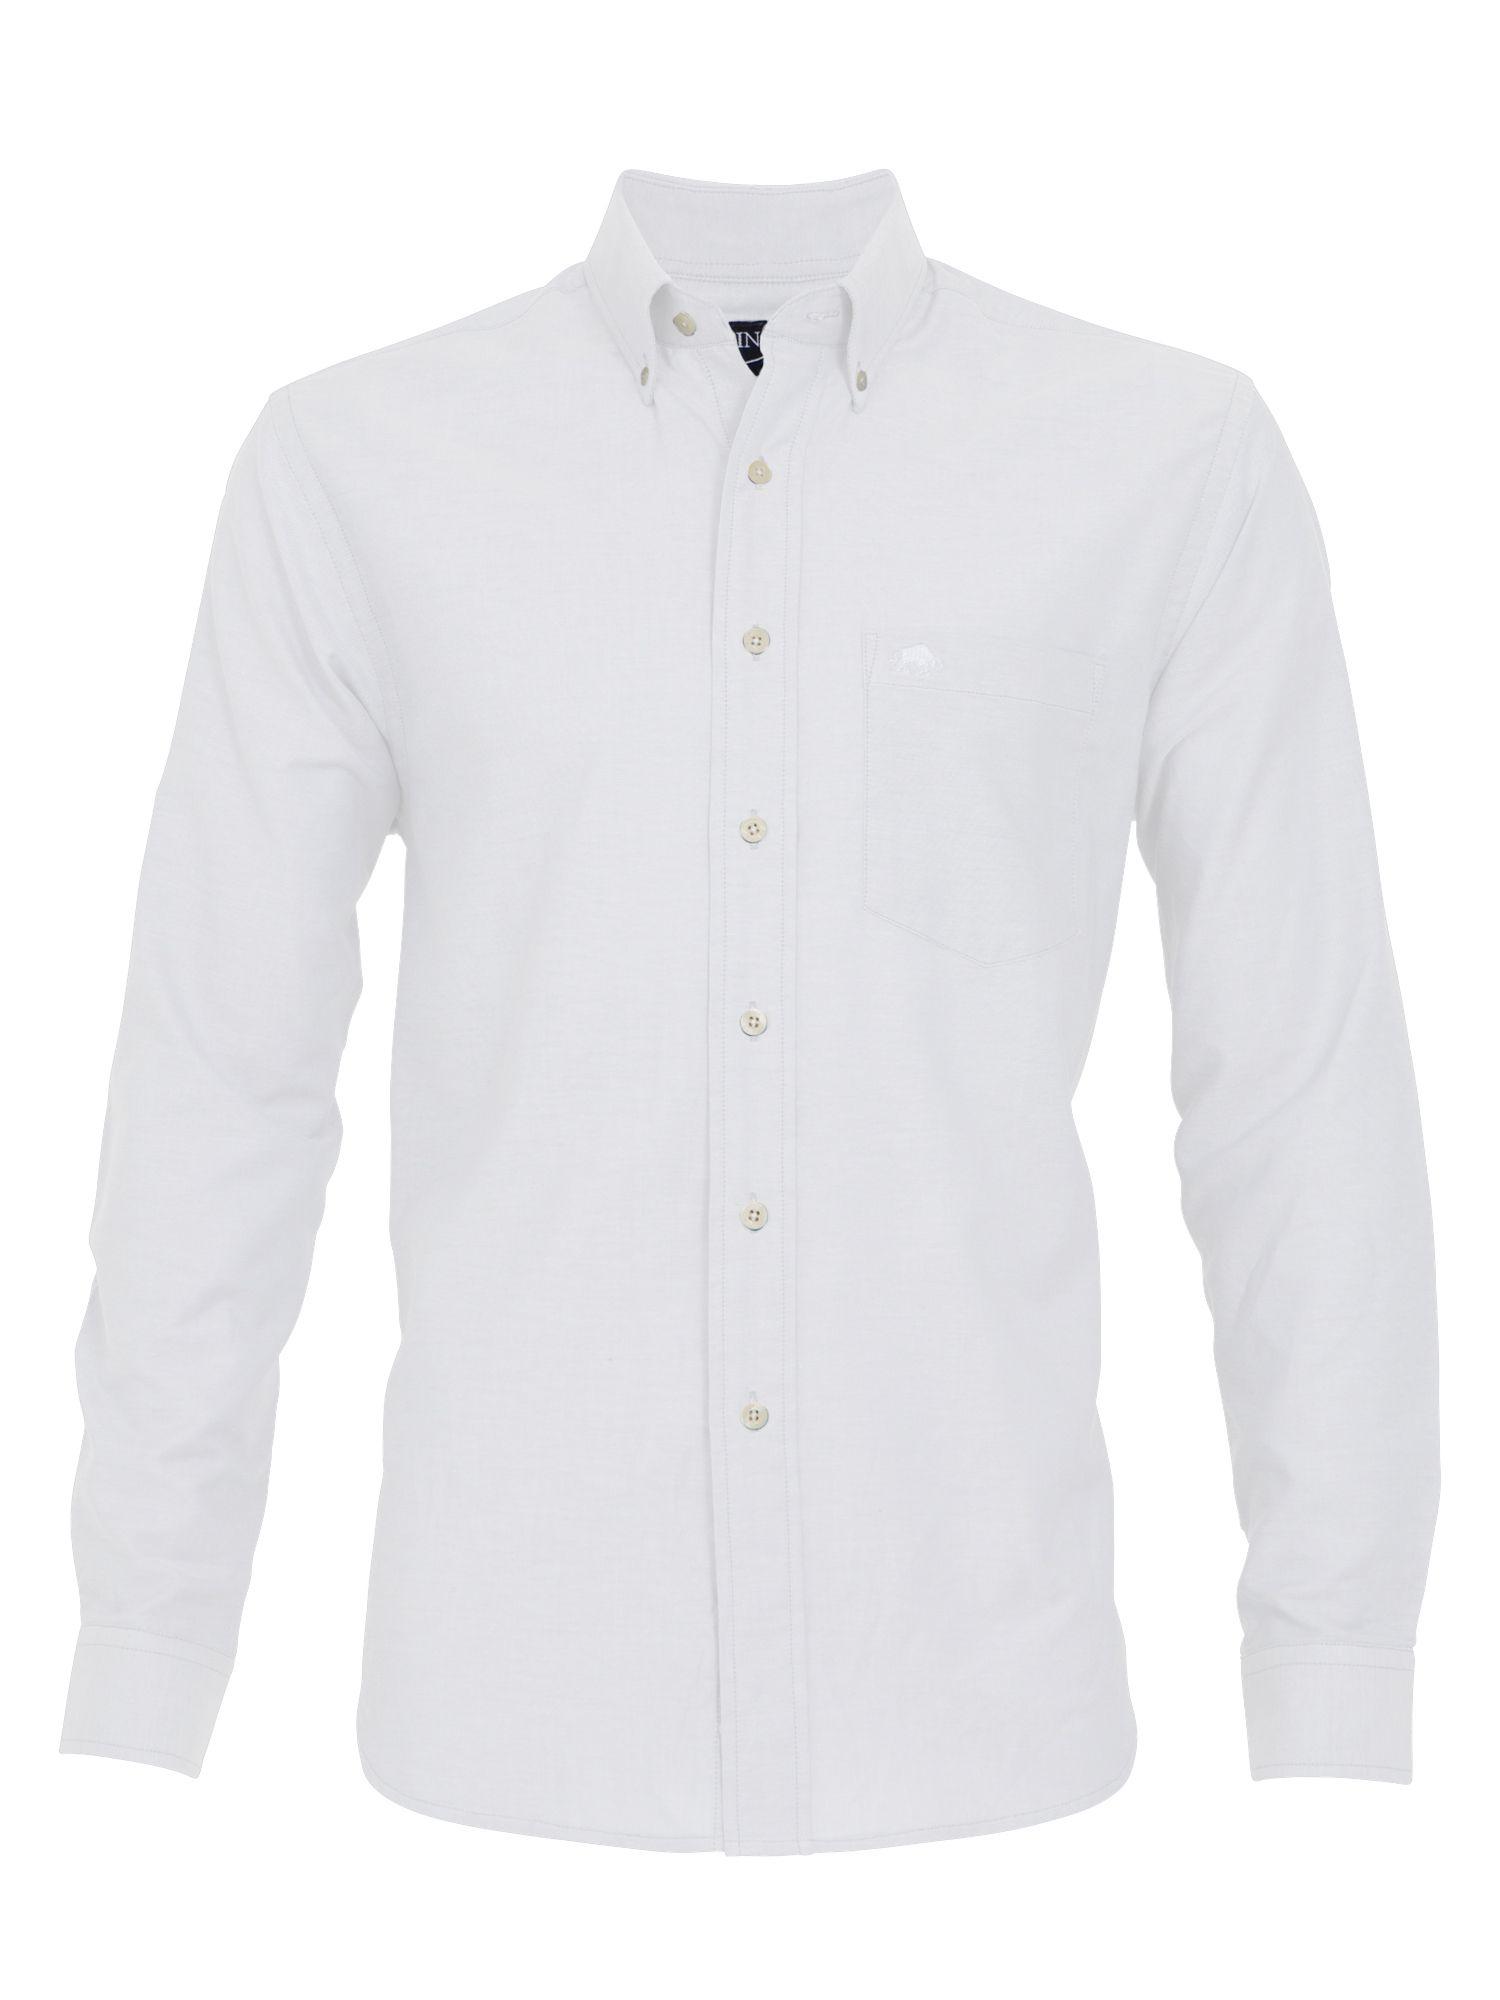 Lyst raging bull big and tall oxford shirt white in for Big and tall oxford shirts